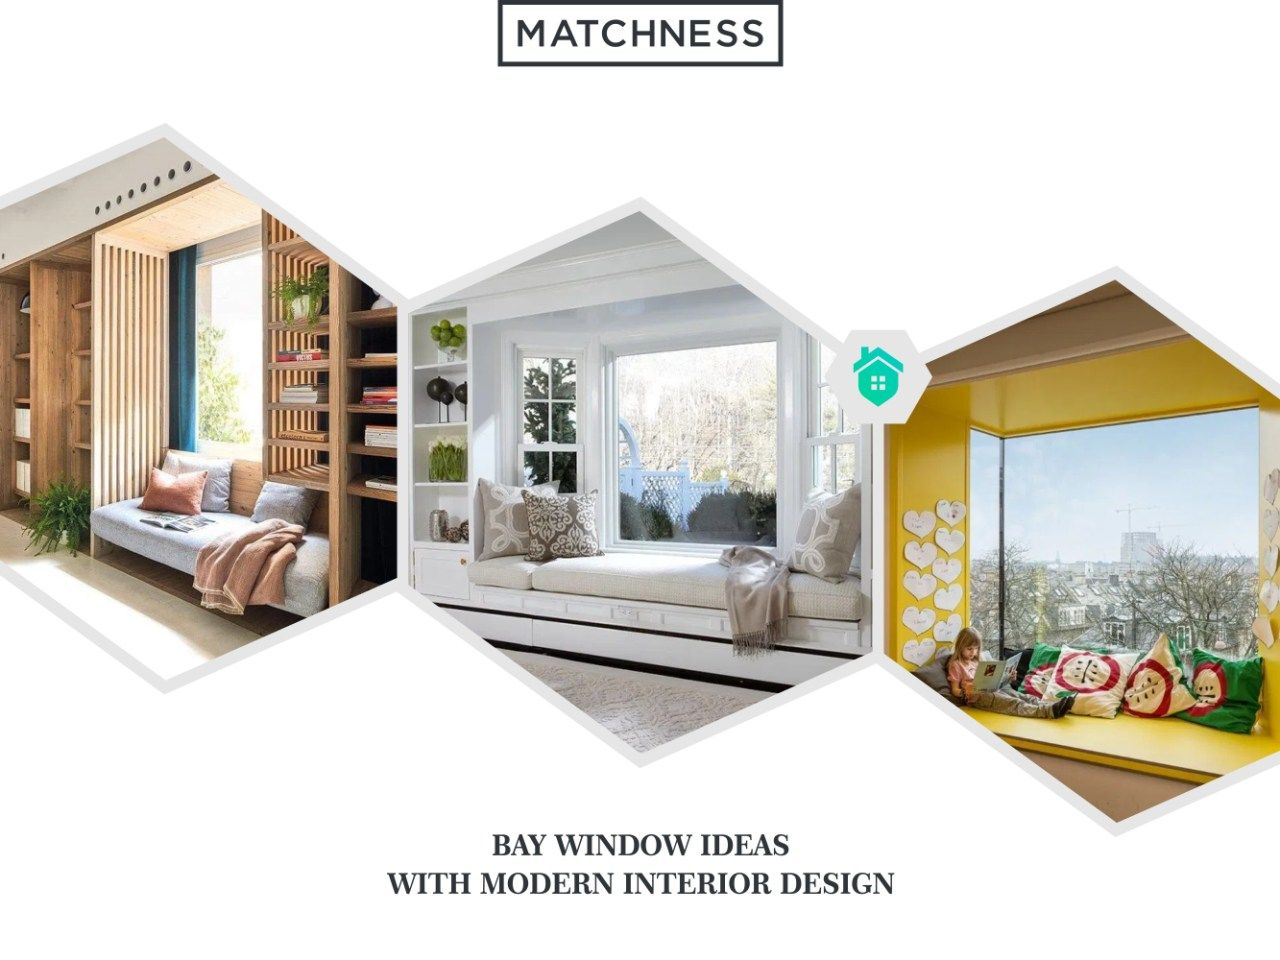 12 Bay Window Ideas with Modern Interior Design ~ Matchness.com ...